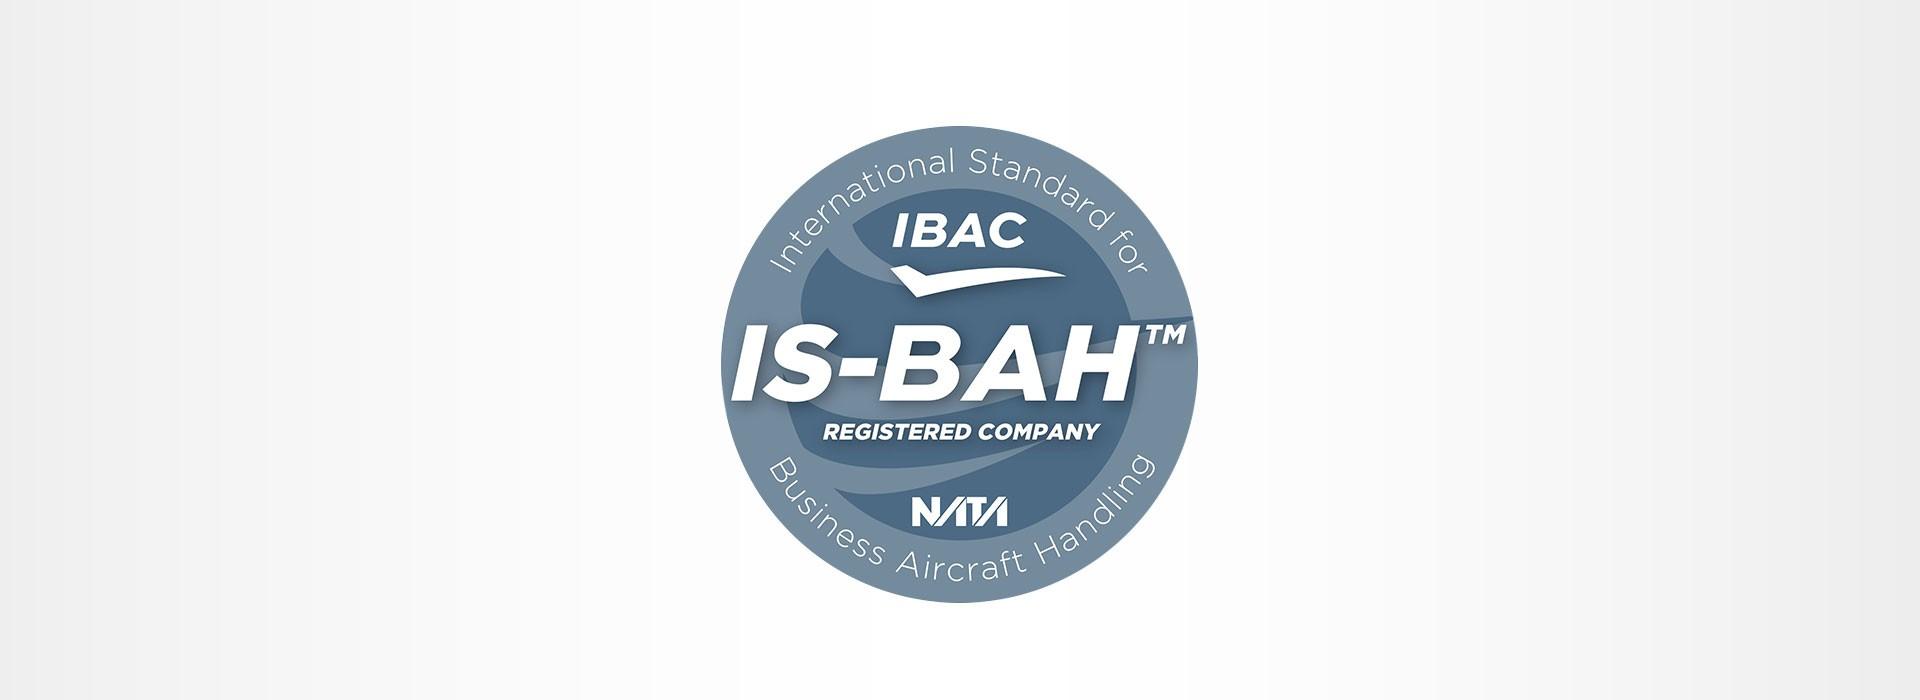 Jetex IS-BAH Certification